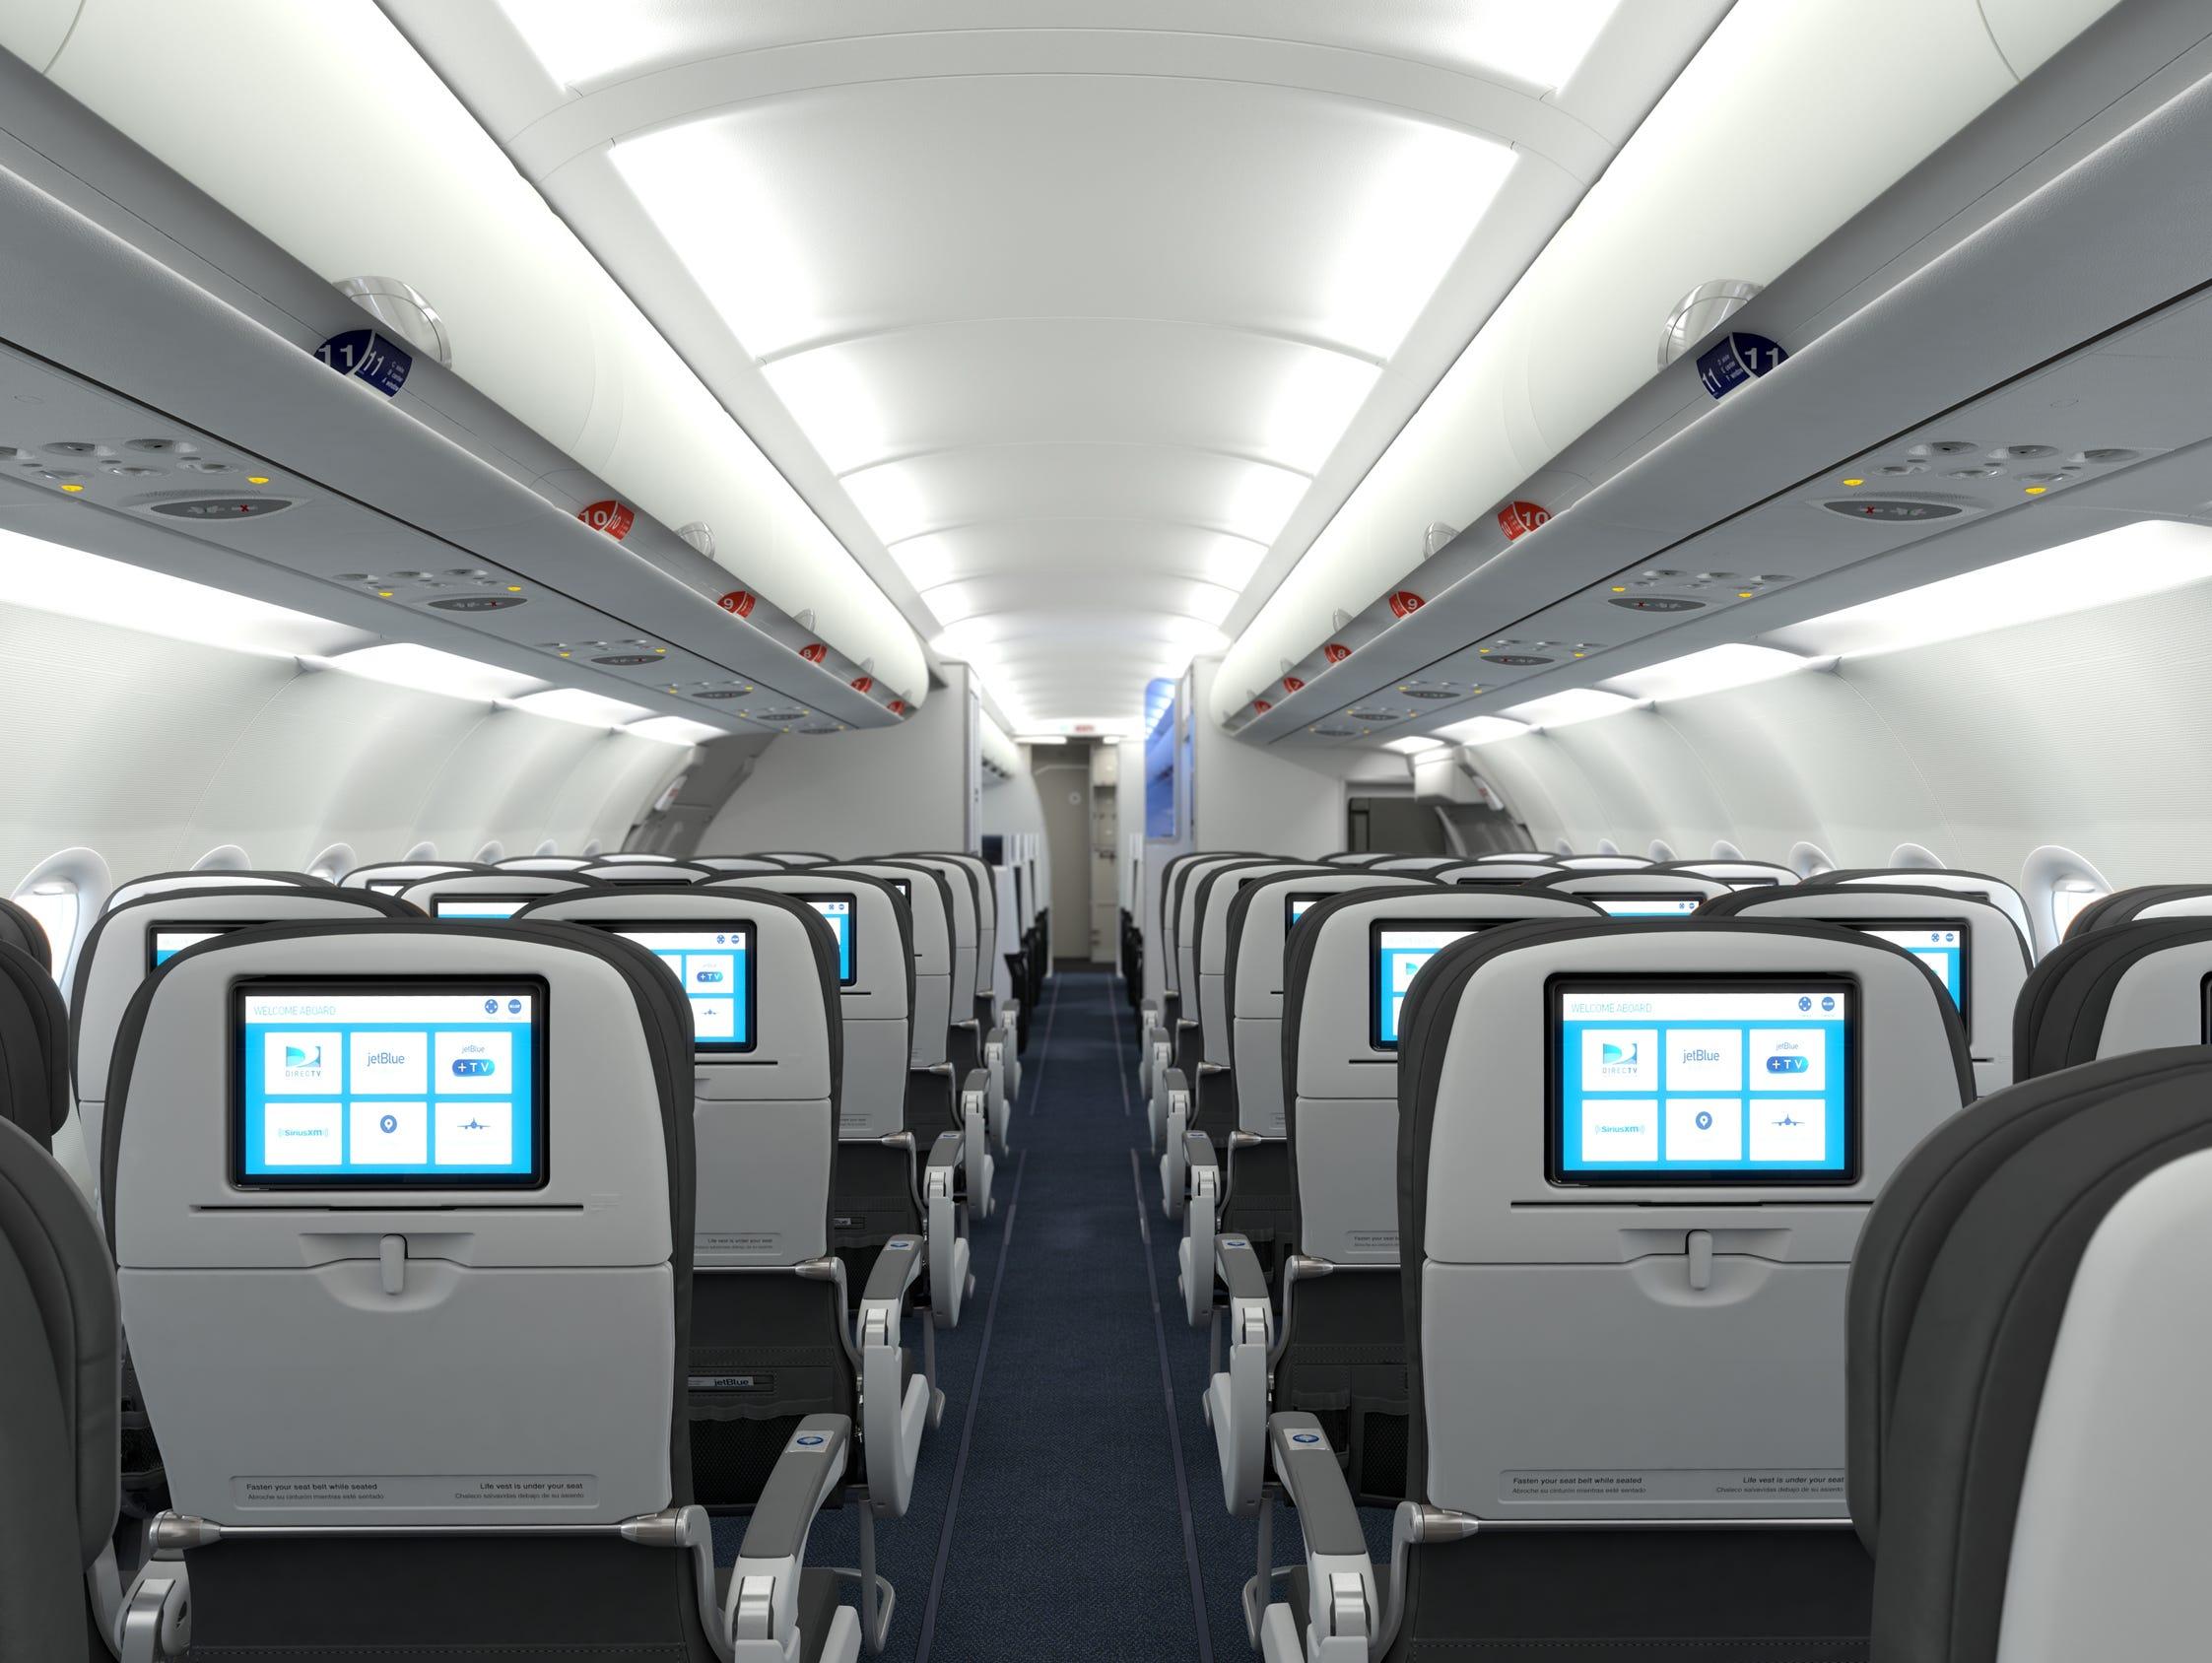 JetBlue flights will include Amazon Prime Instant Video content.